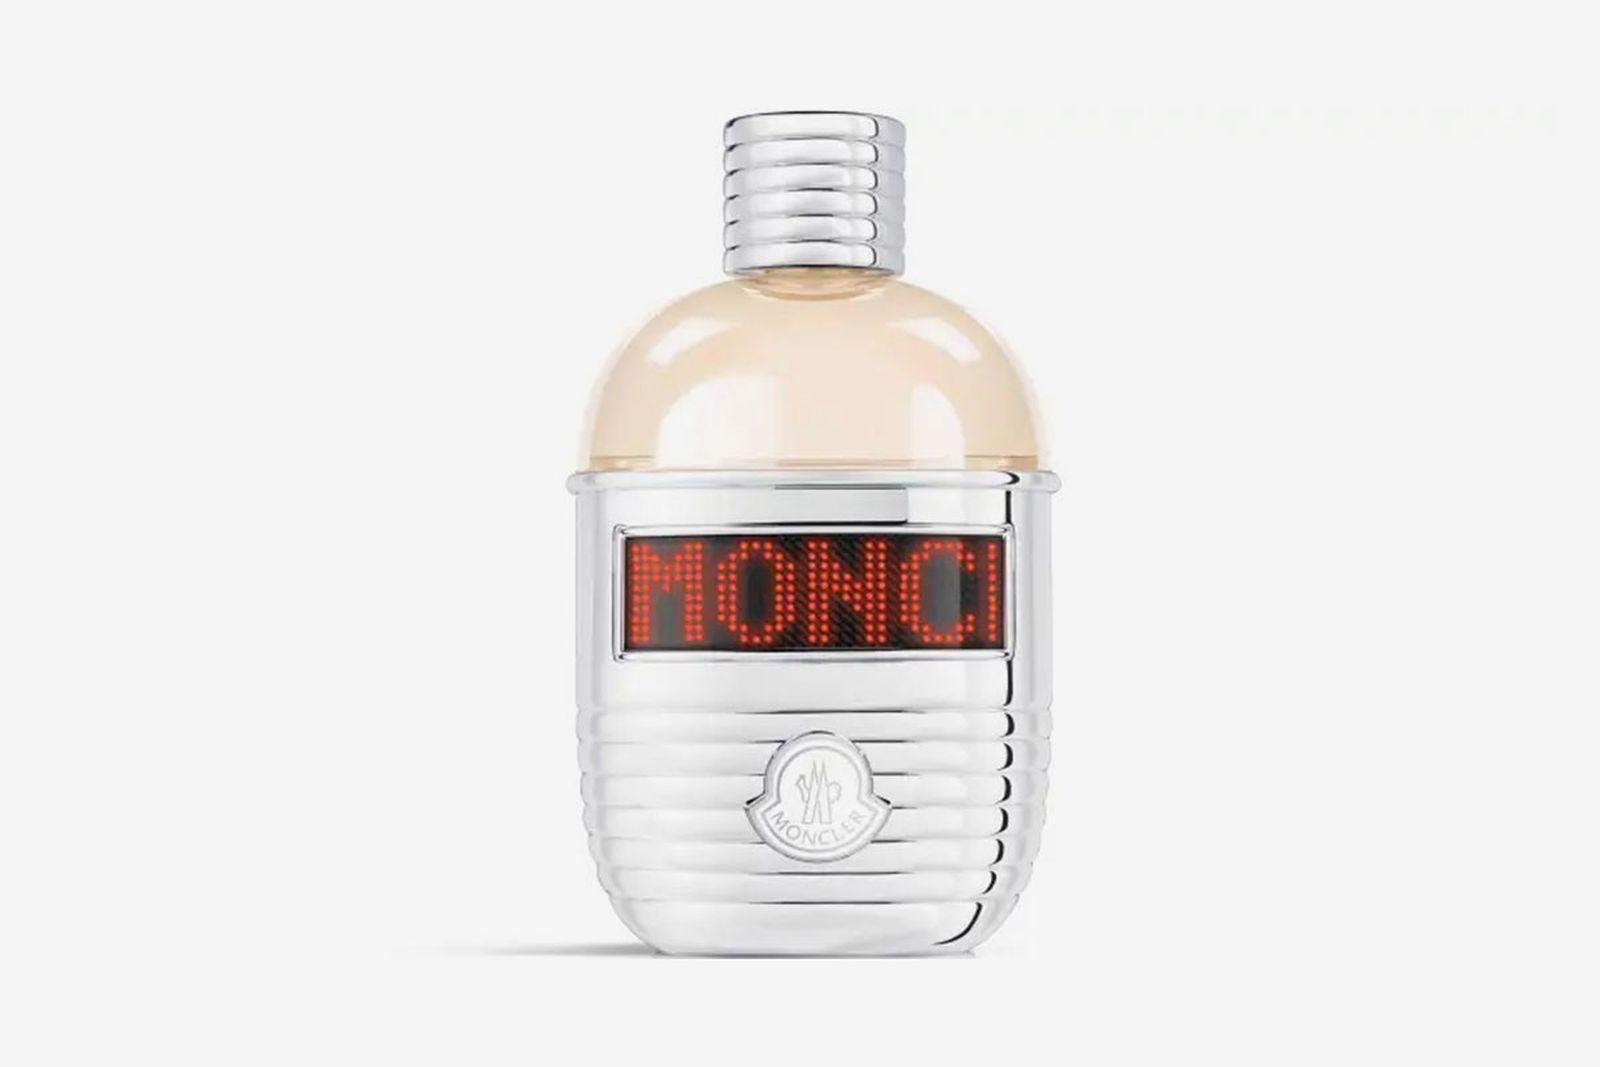 moncler-fragrance-perfume-01